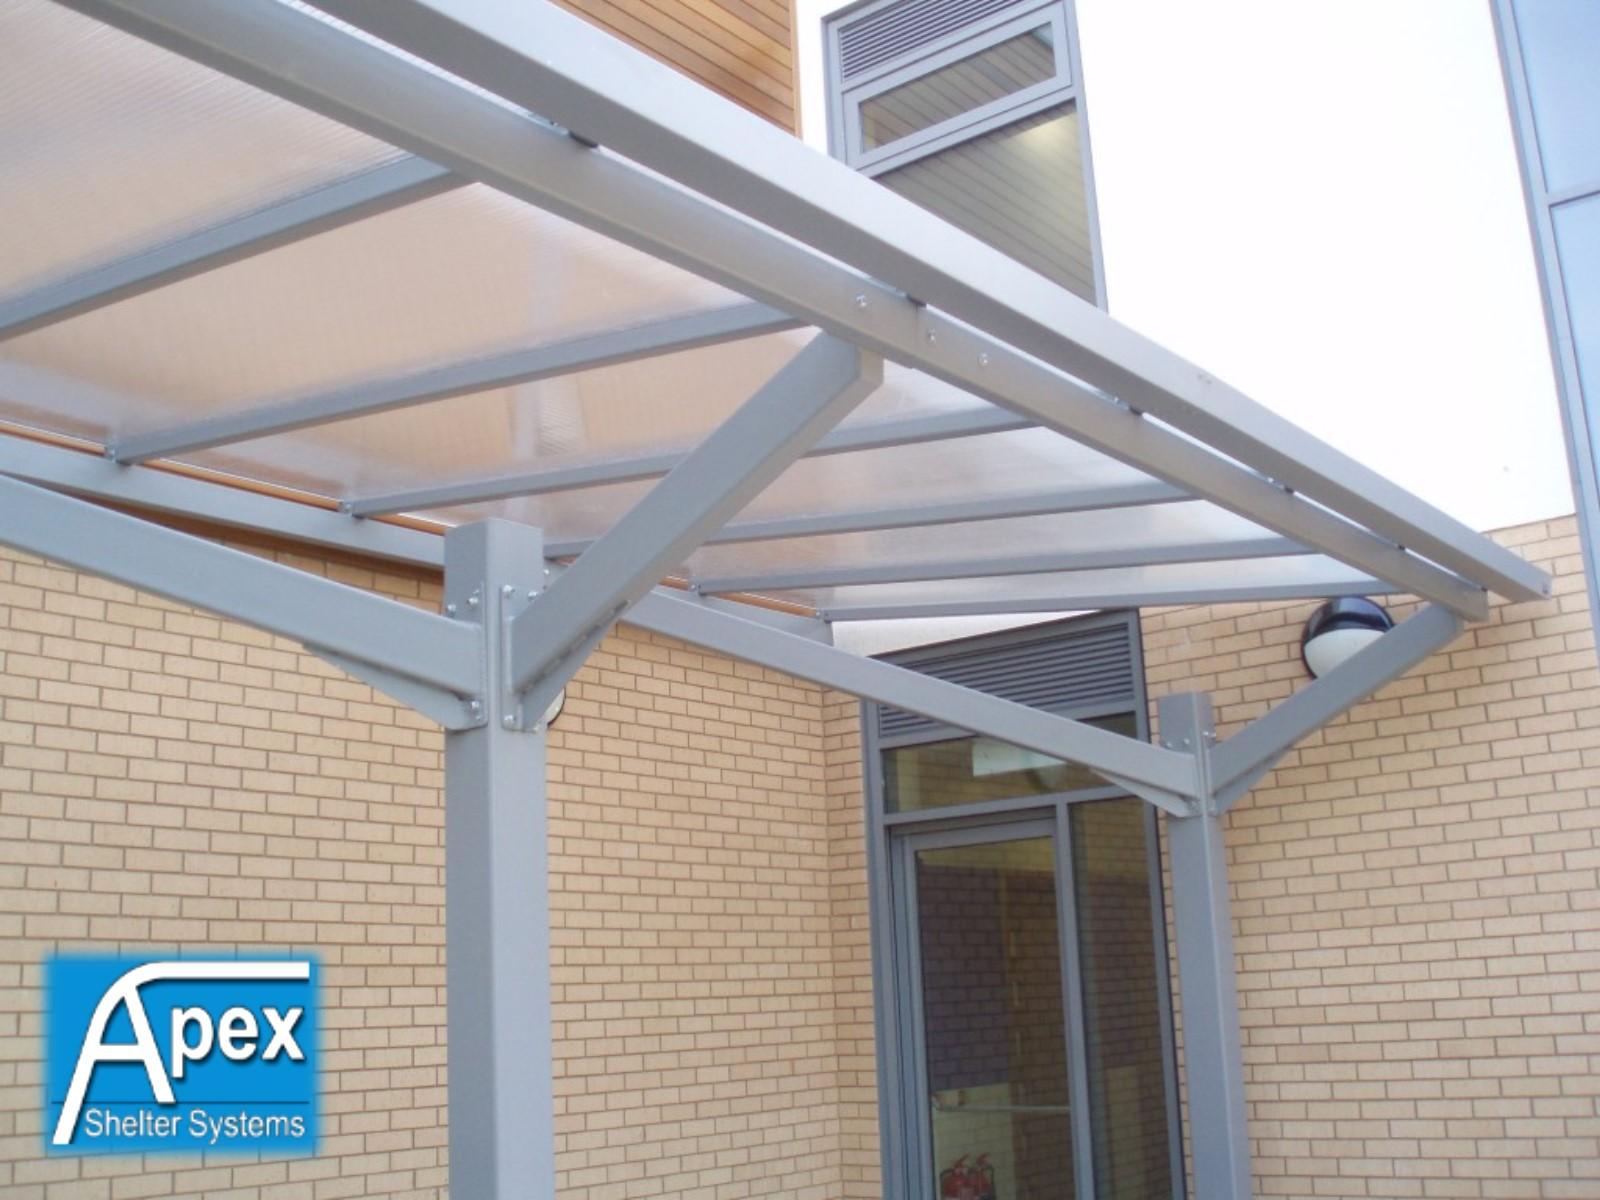 Paisley Entrance Door Canopy & Entrance Canopy Door Canopy - Apex Shelter SystemsApex Shelters